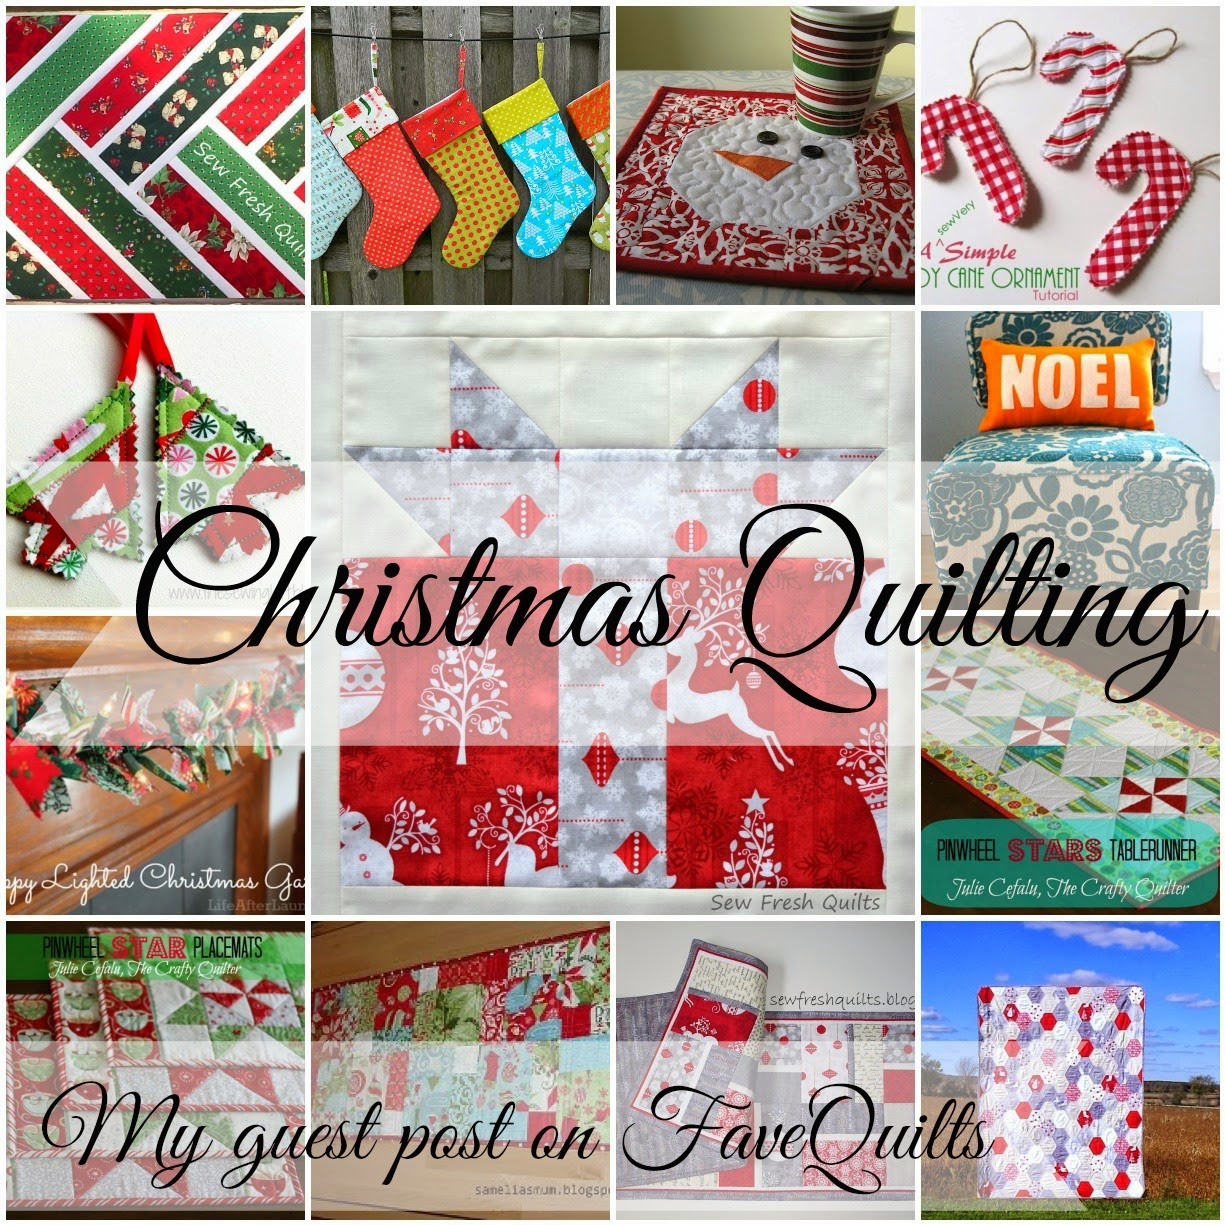 http://www.seamsandscissors.com/get-inspired-christmas-quilting-ideas